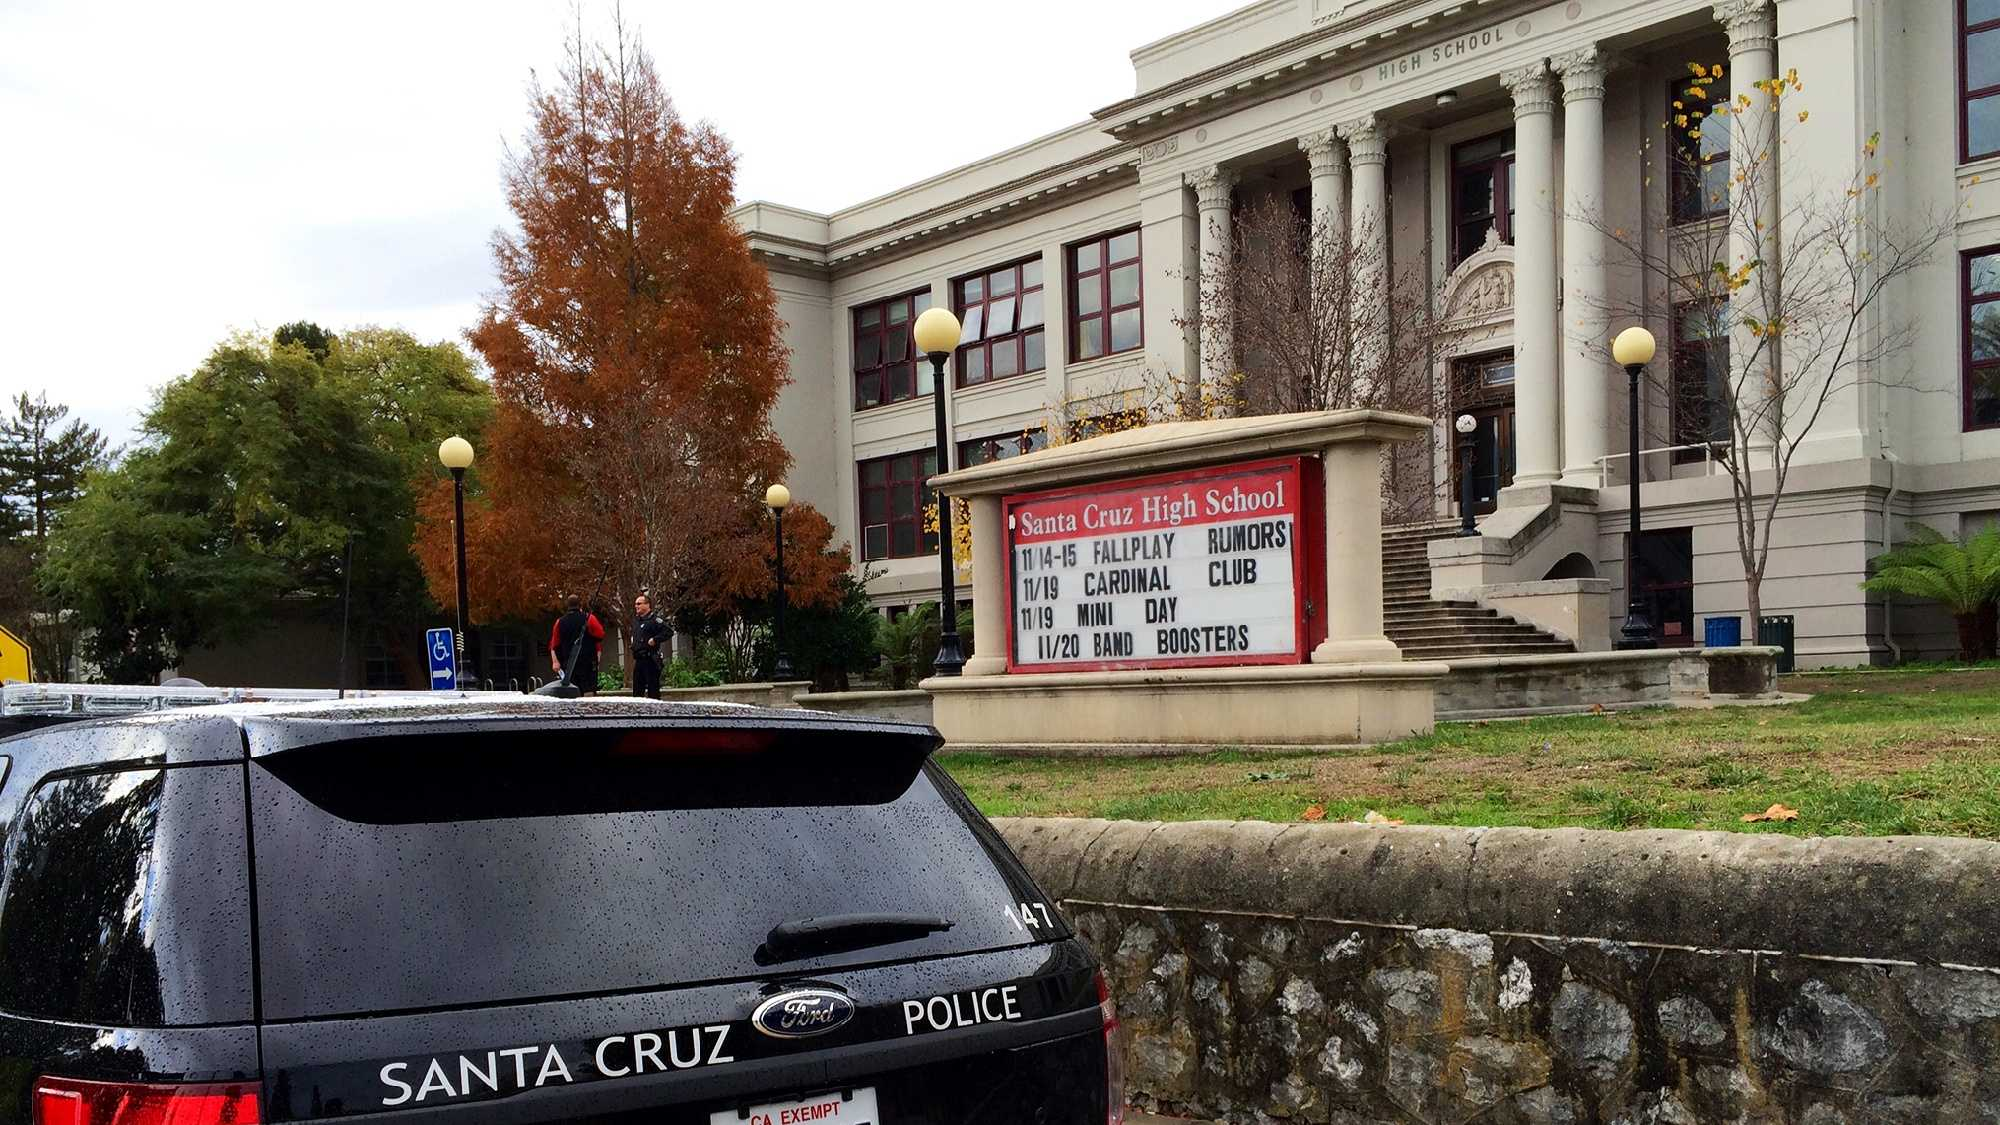 Santa Cruz High School